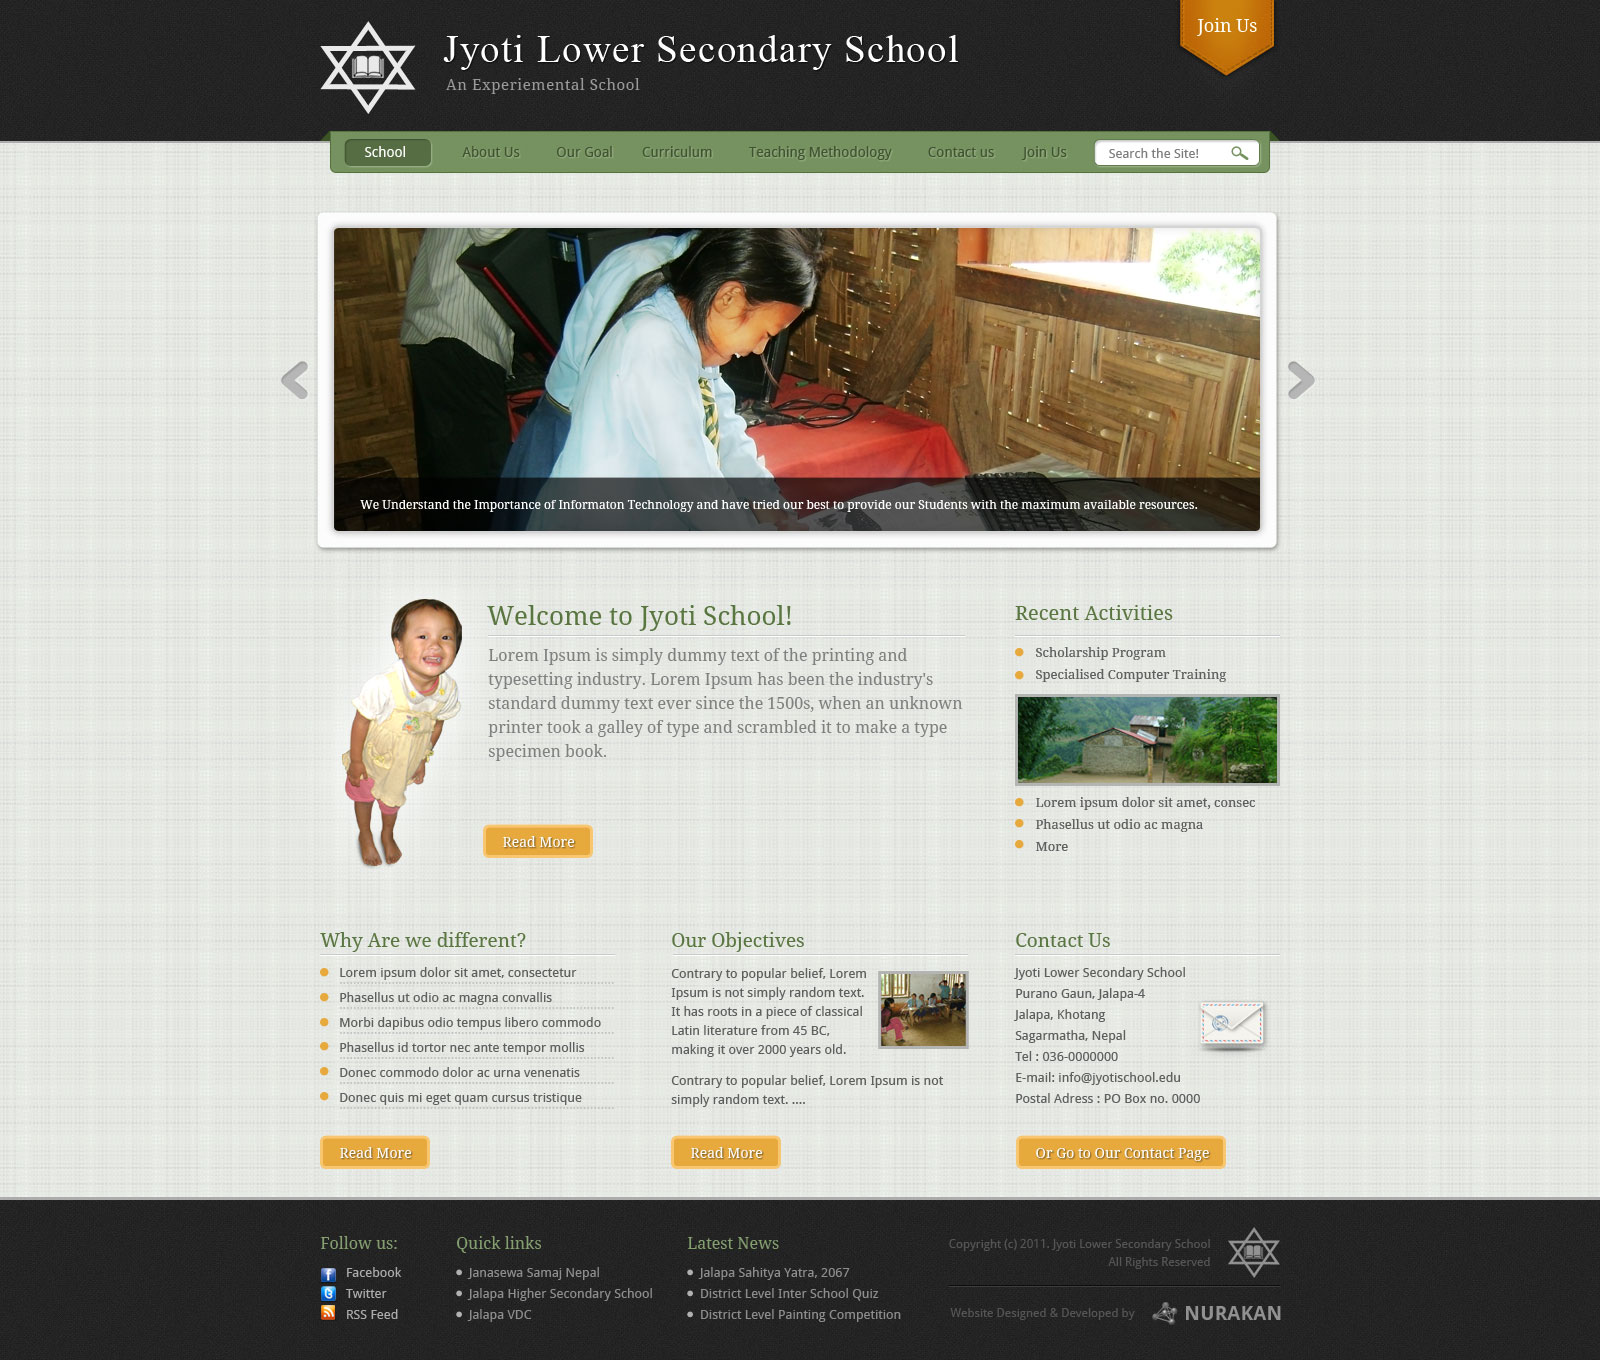 Jyoti Lower Secondary School